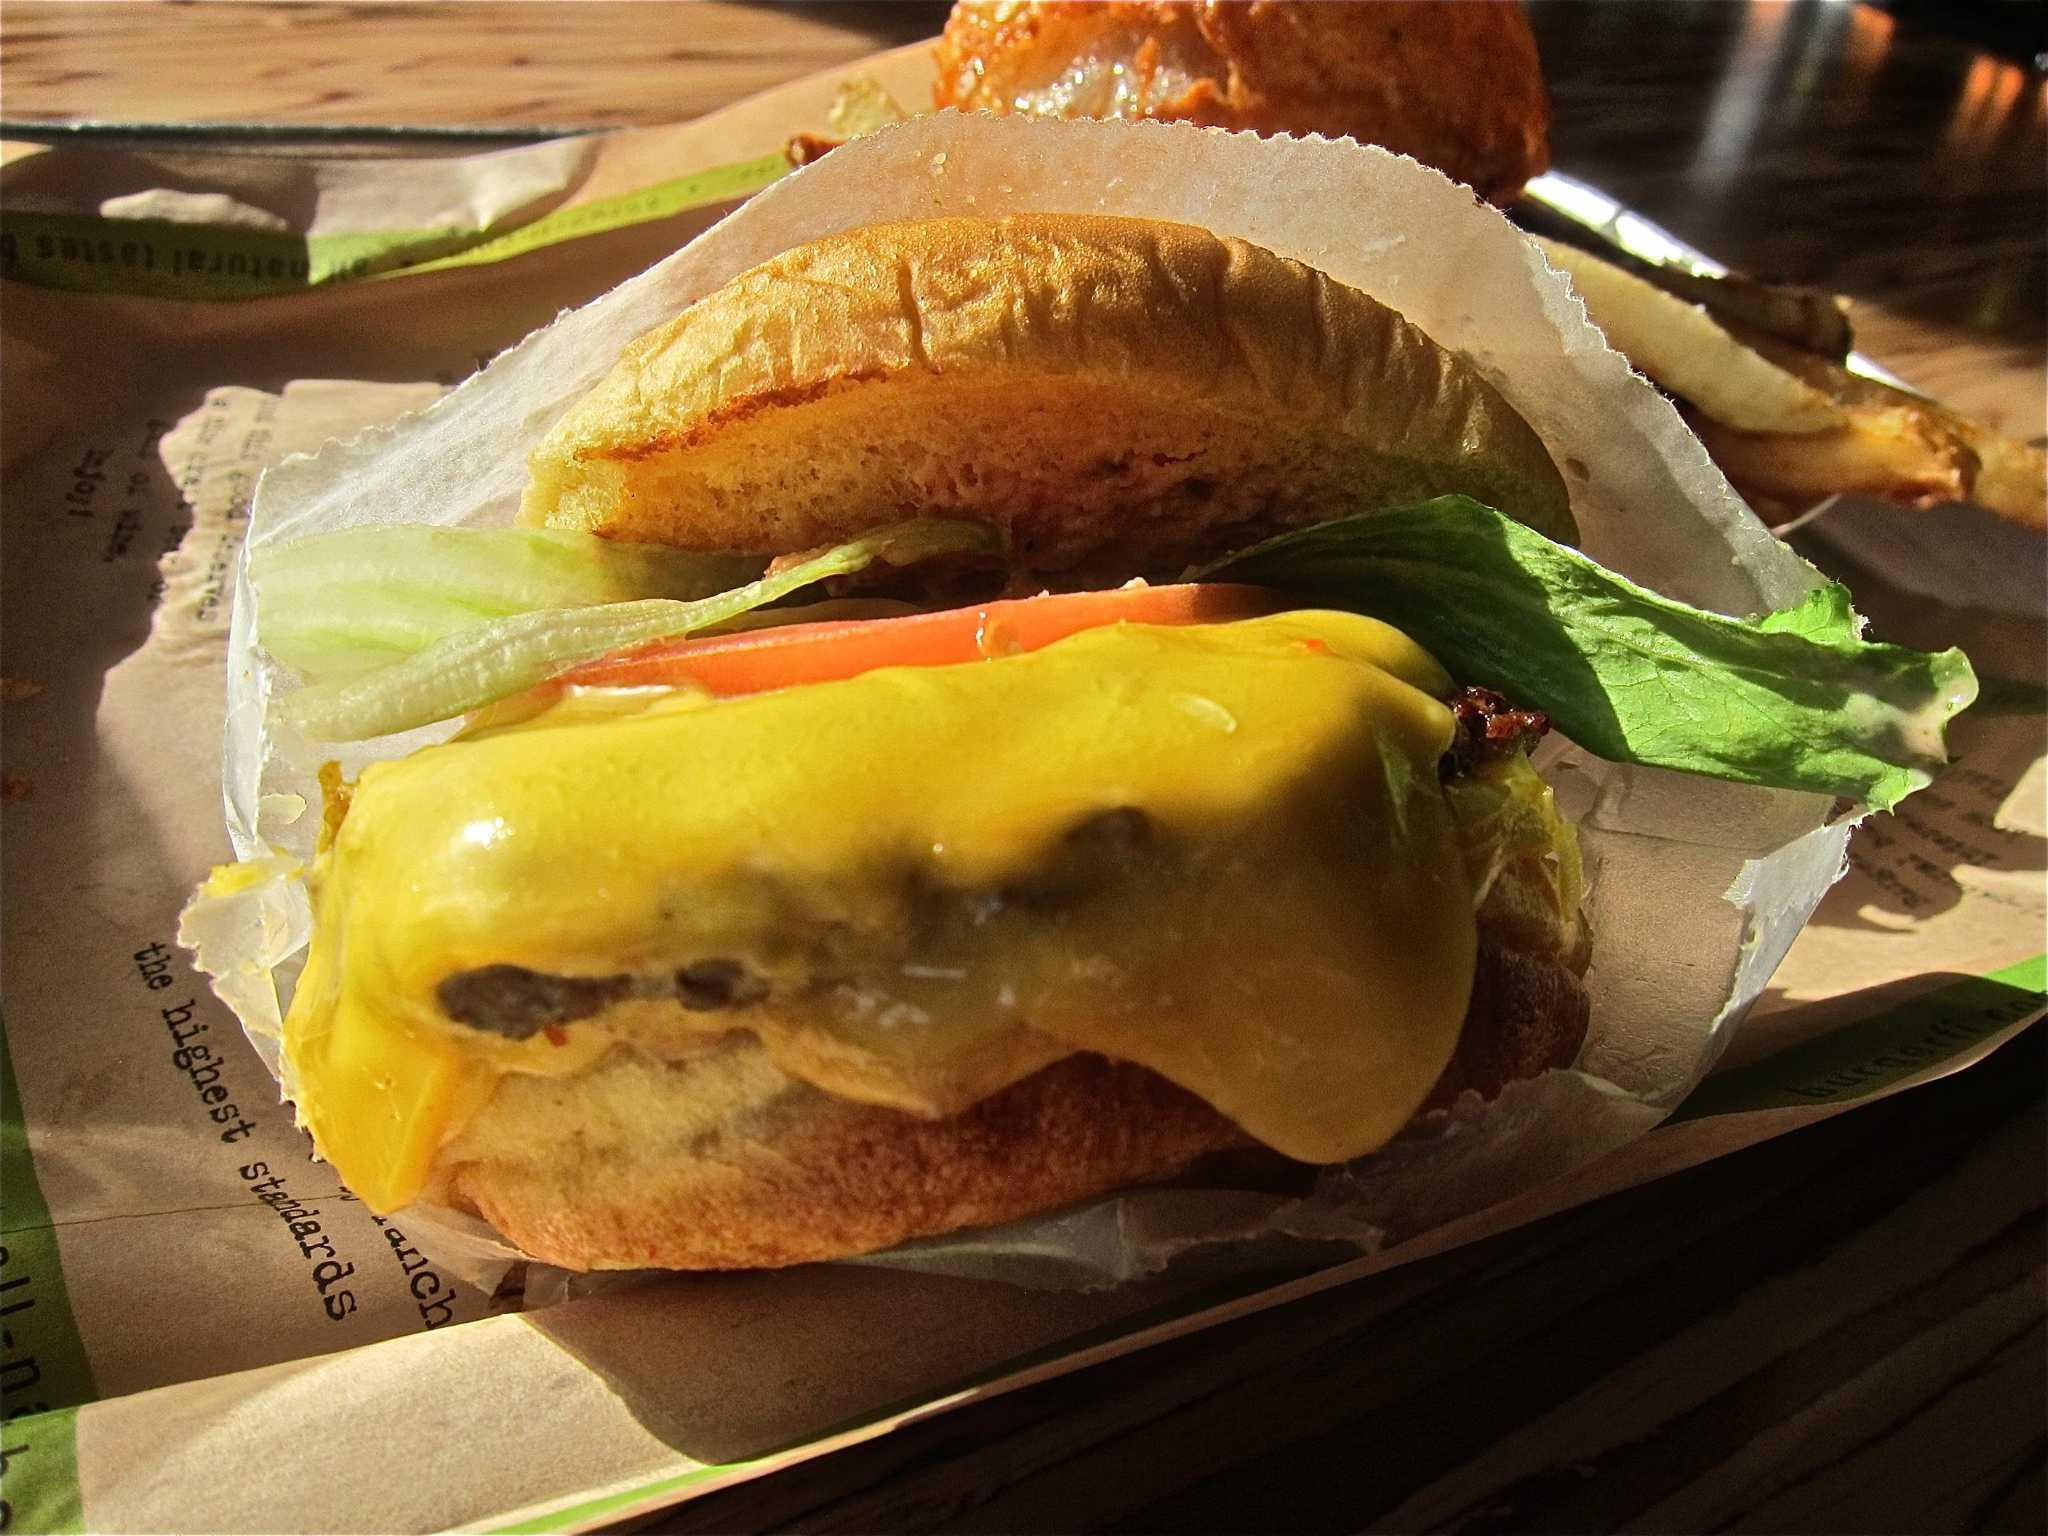 BurgerFi to reopen Monday in Alamo Heights - San Antonio Express-News